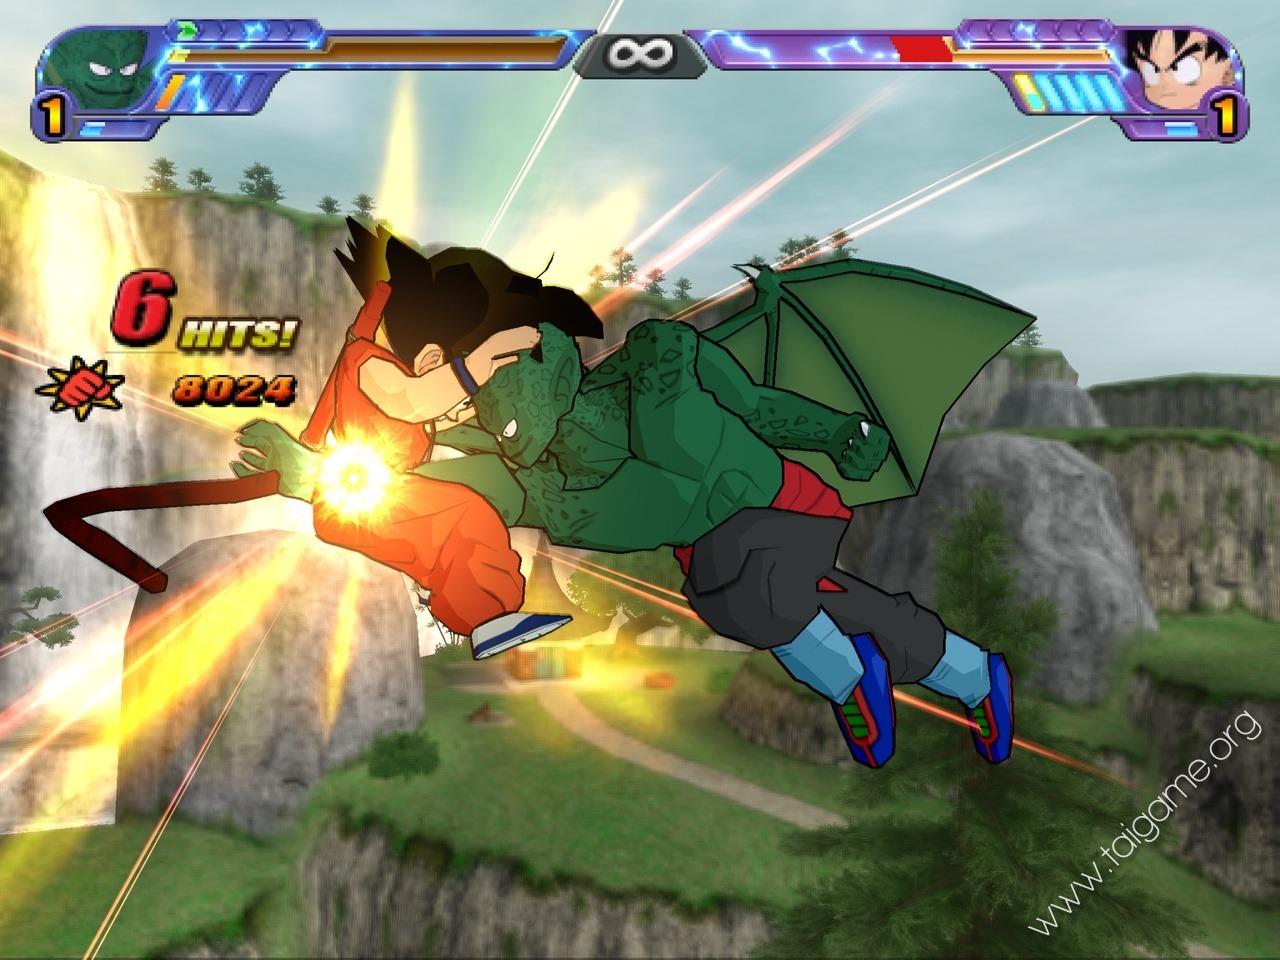 Dragon Ball Z Full Pc Games Free Download